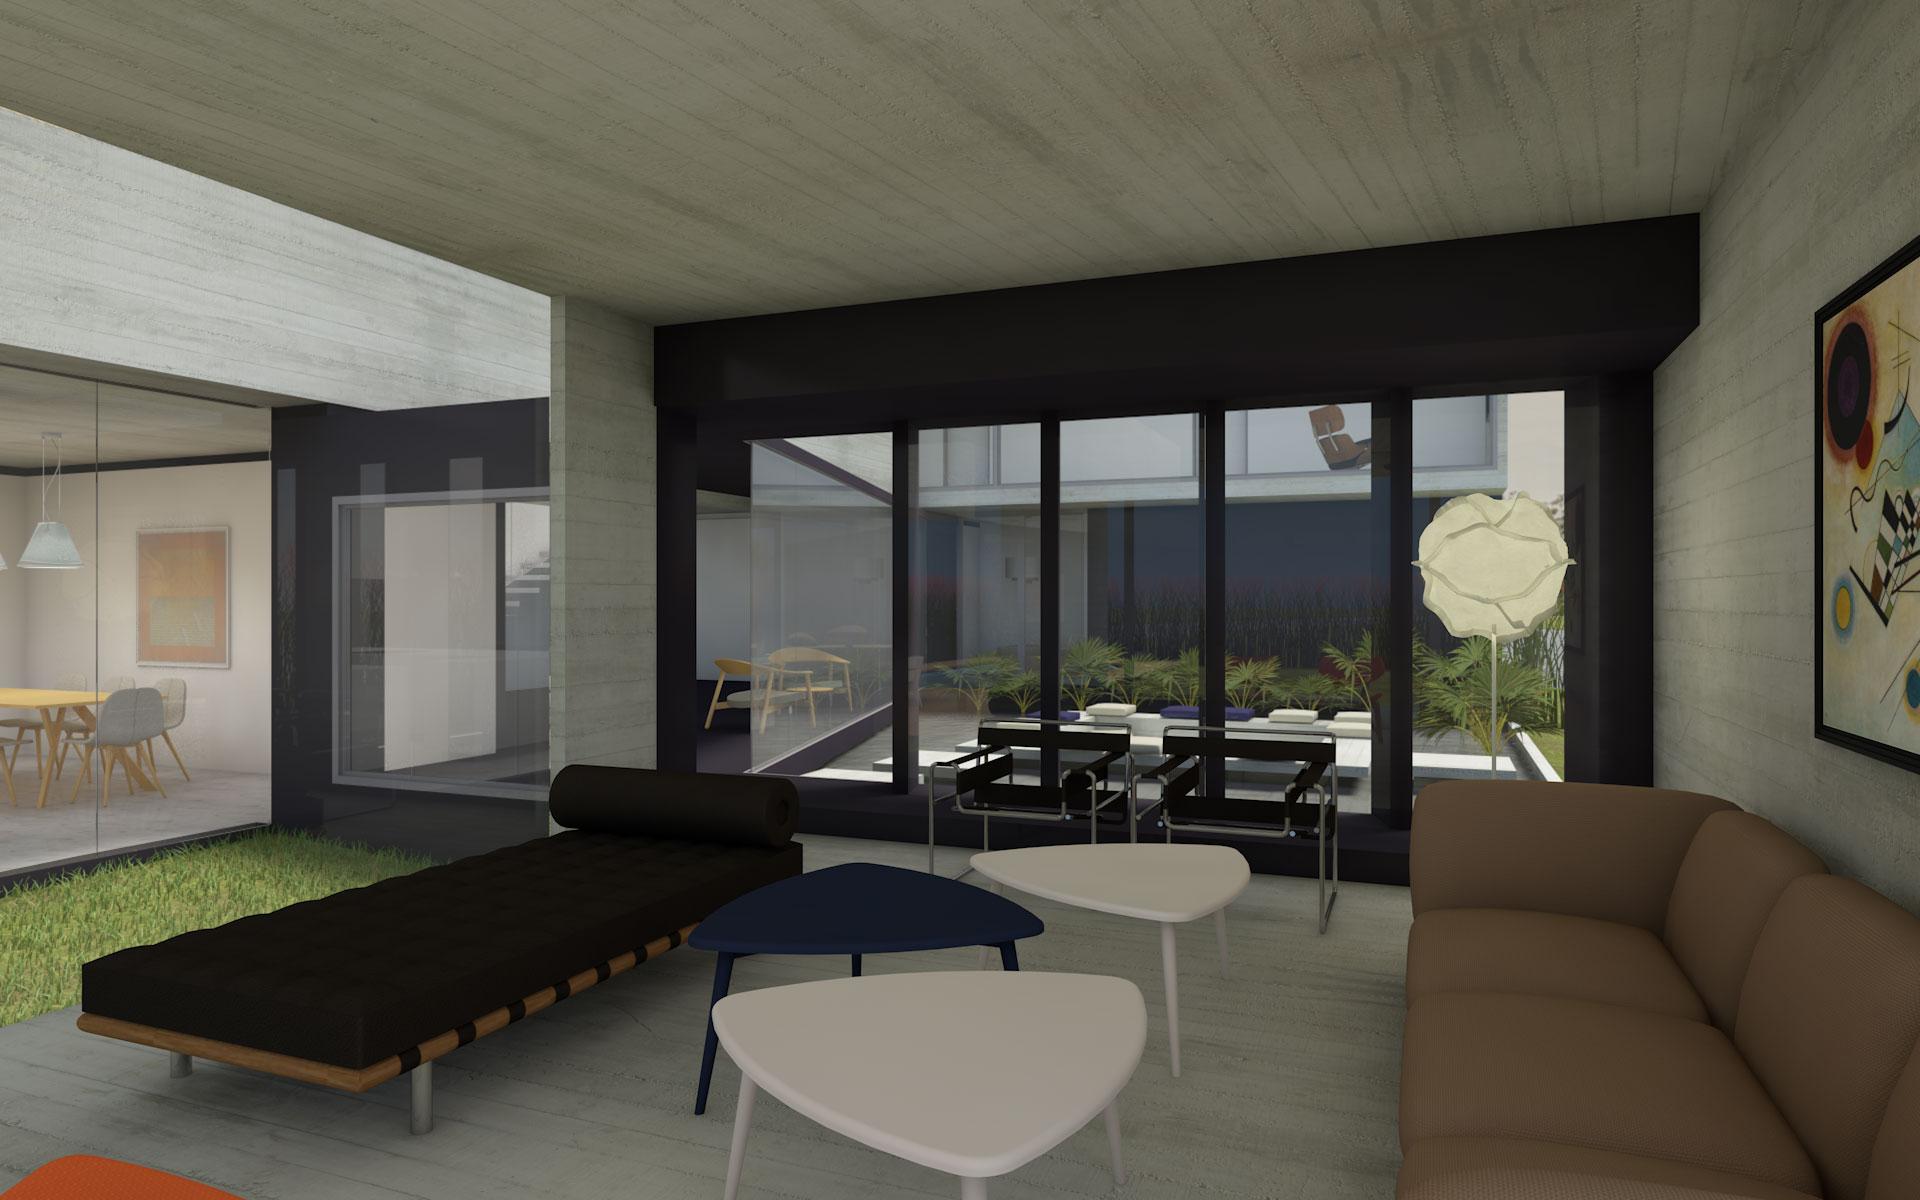 Arquitectura, living con muebles clásicos, casa de hormigón visto moderna y carpinterías metálicas negras